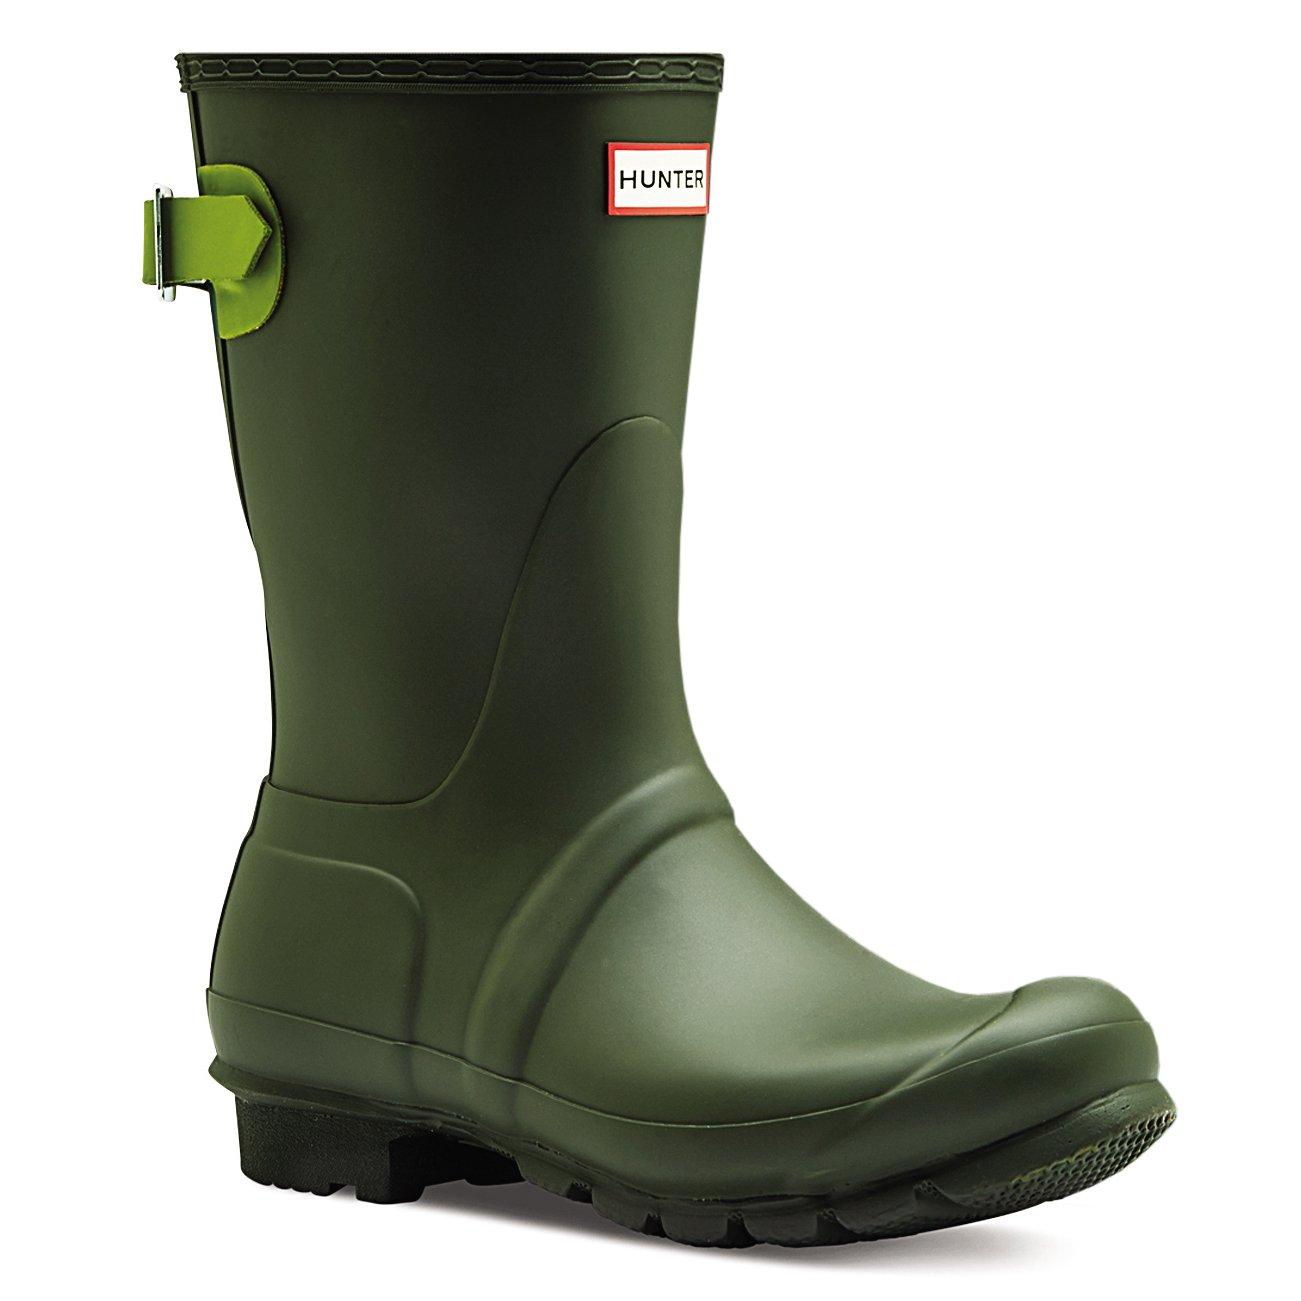 Hunter Womens Original Adjustable Back Short Snow Waterproof Rain Boots - Dark Olive/Kelp - 5